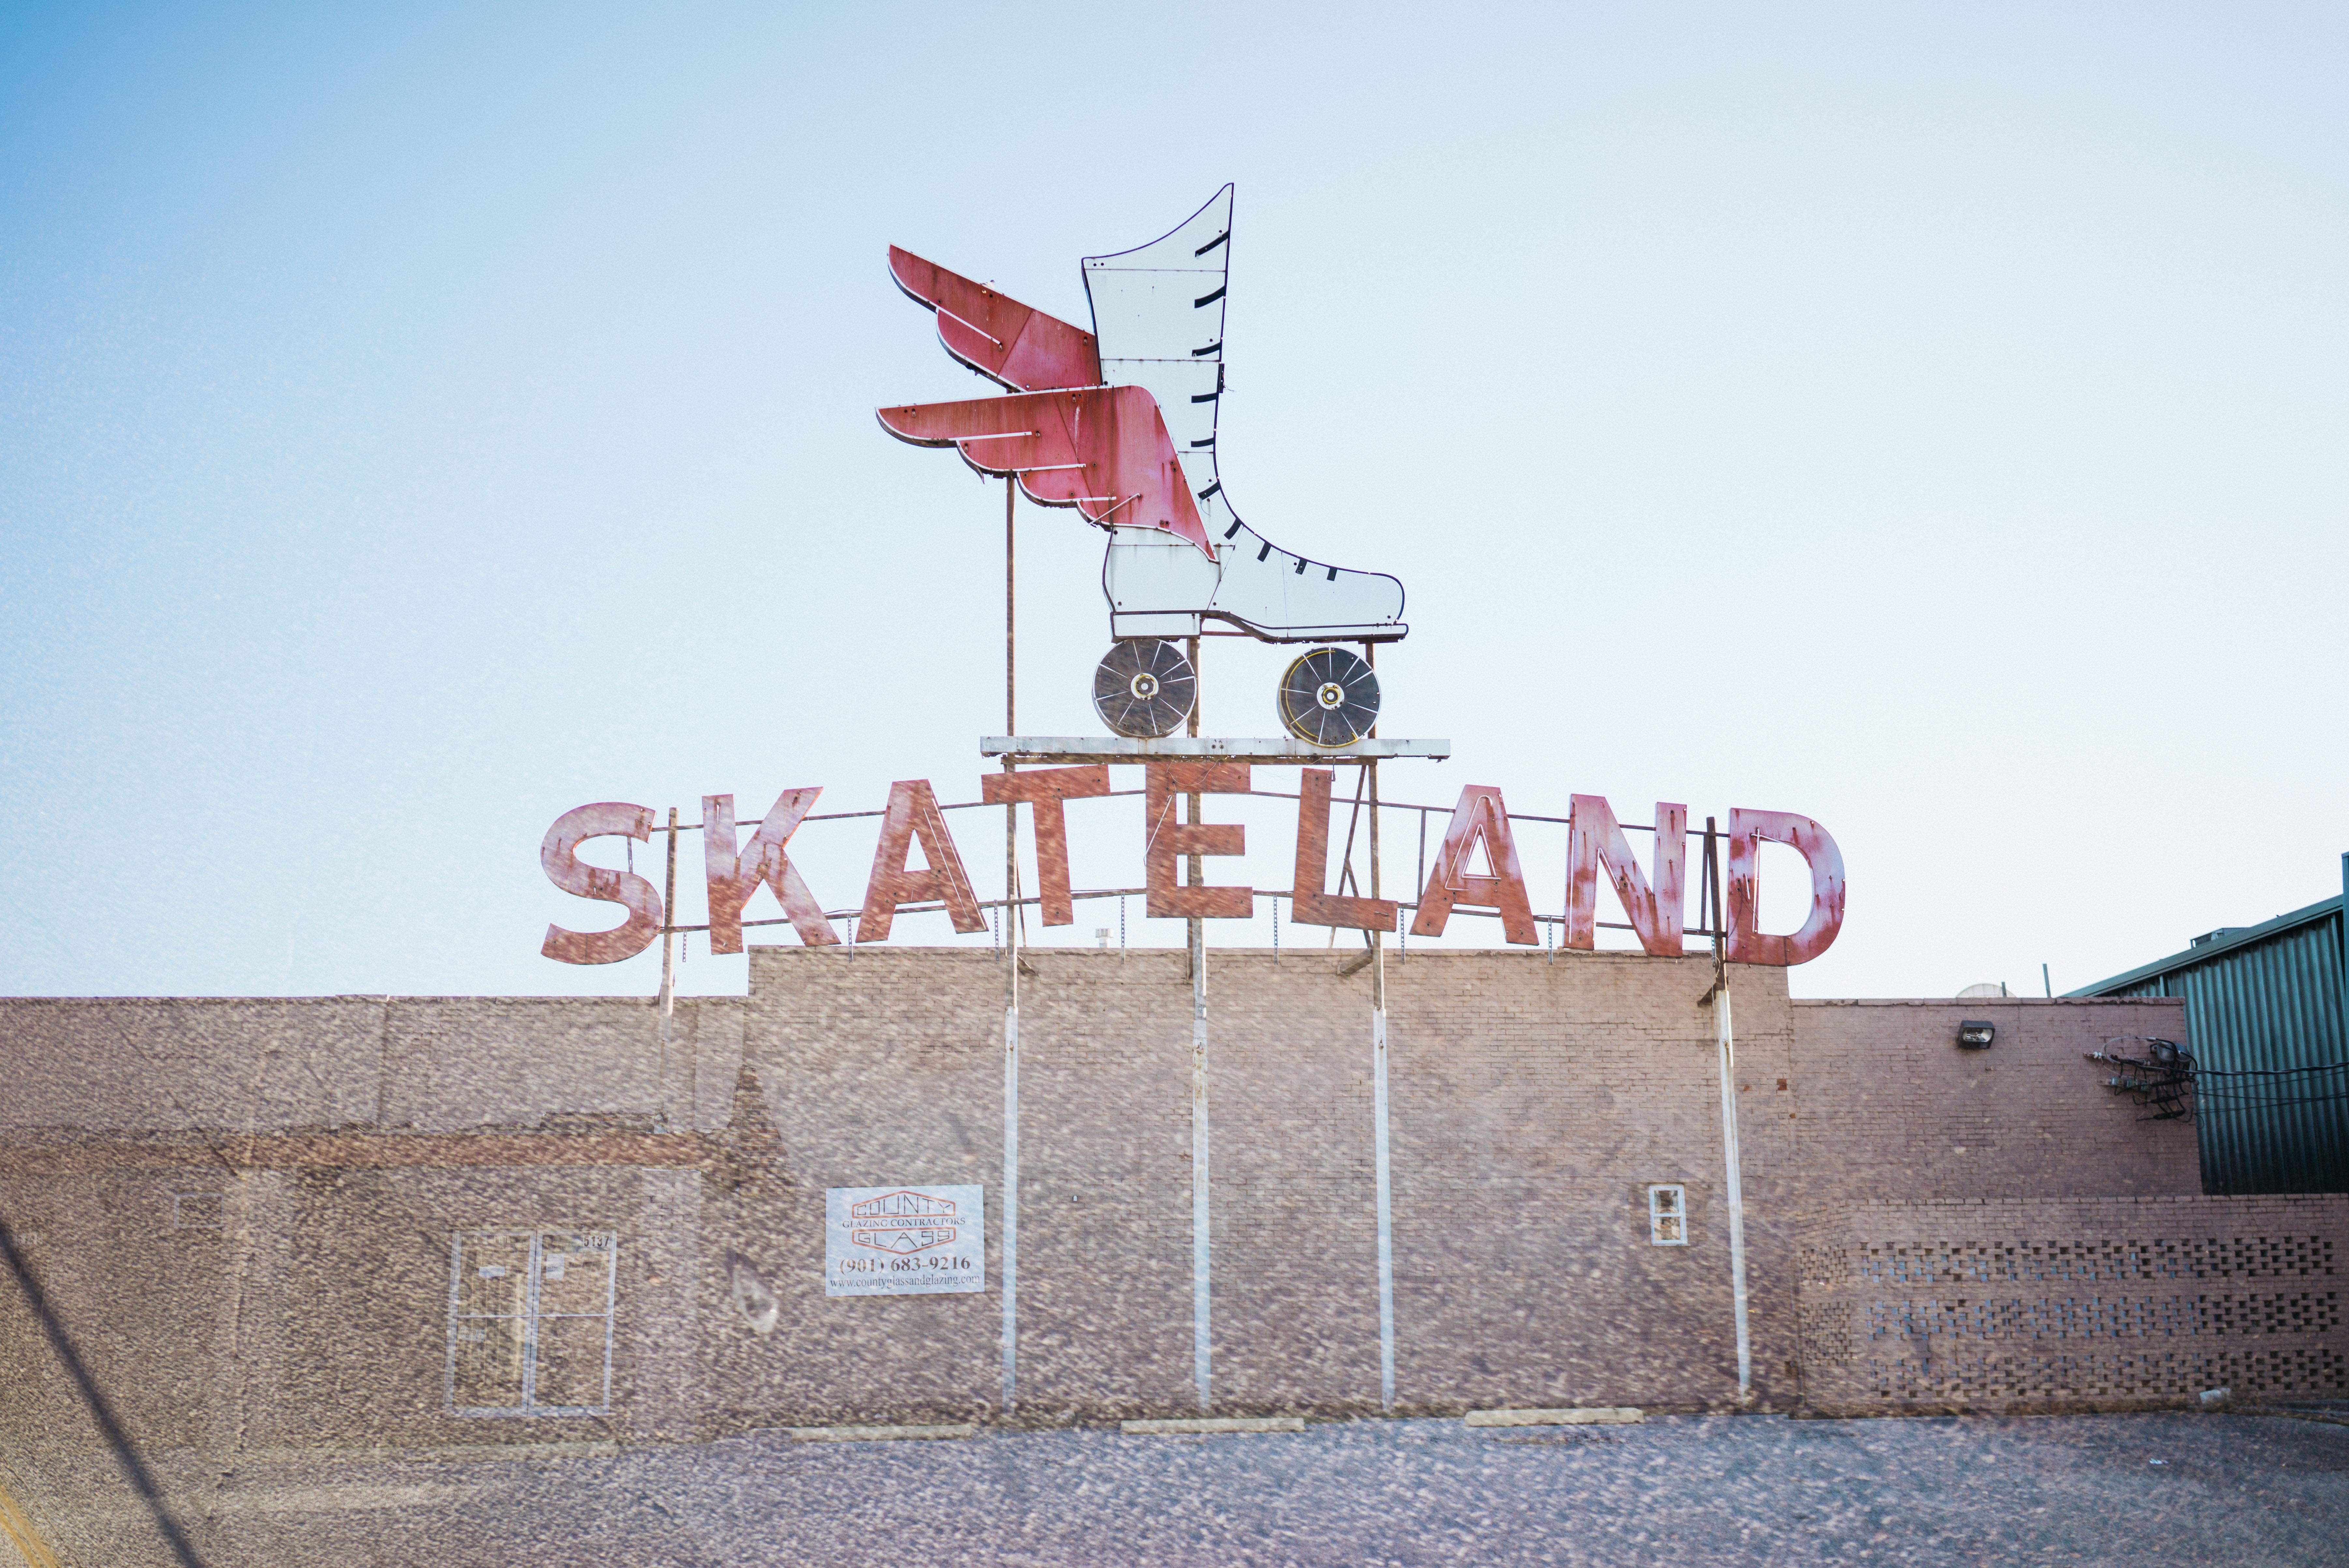 Skateland storefront